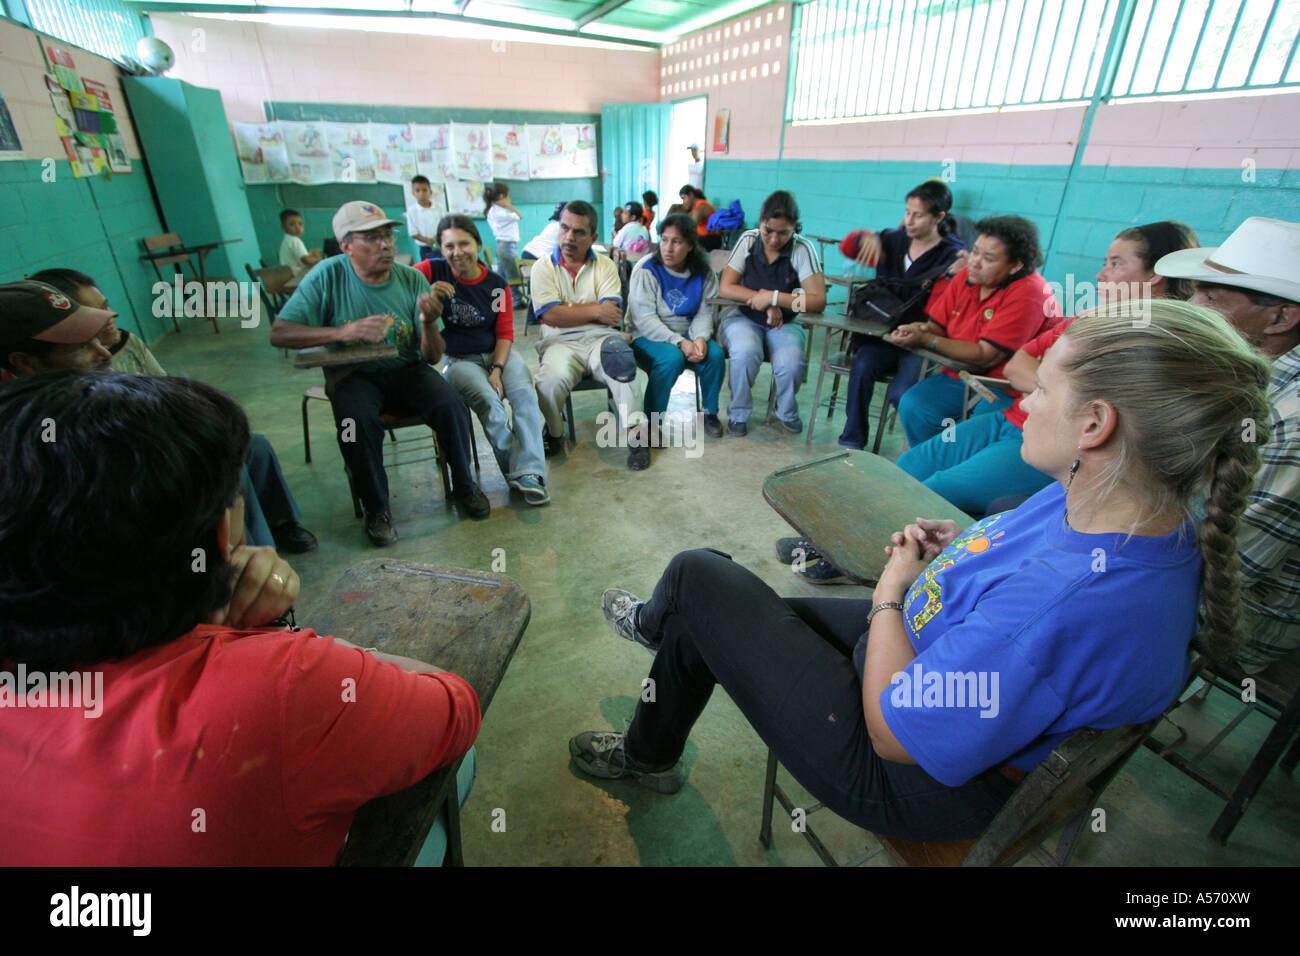 Painet ja1236 venezuela meeting teachers parents primary school village chamiza lara state latin america south 20051001 - Stock Image